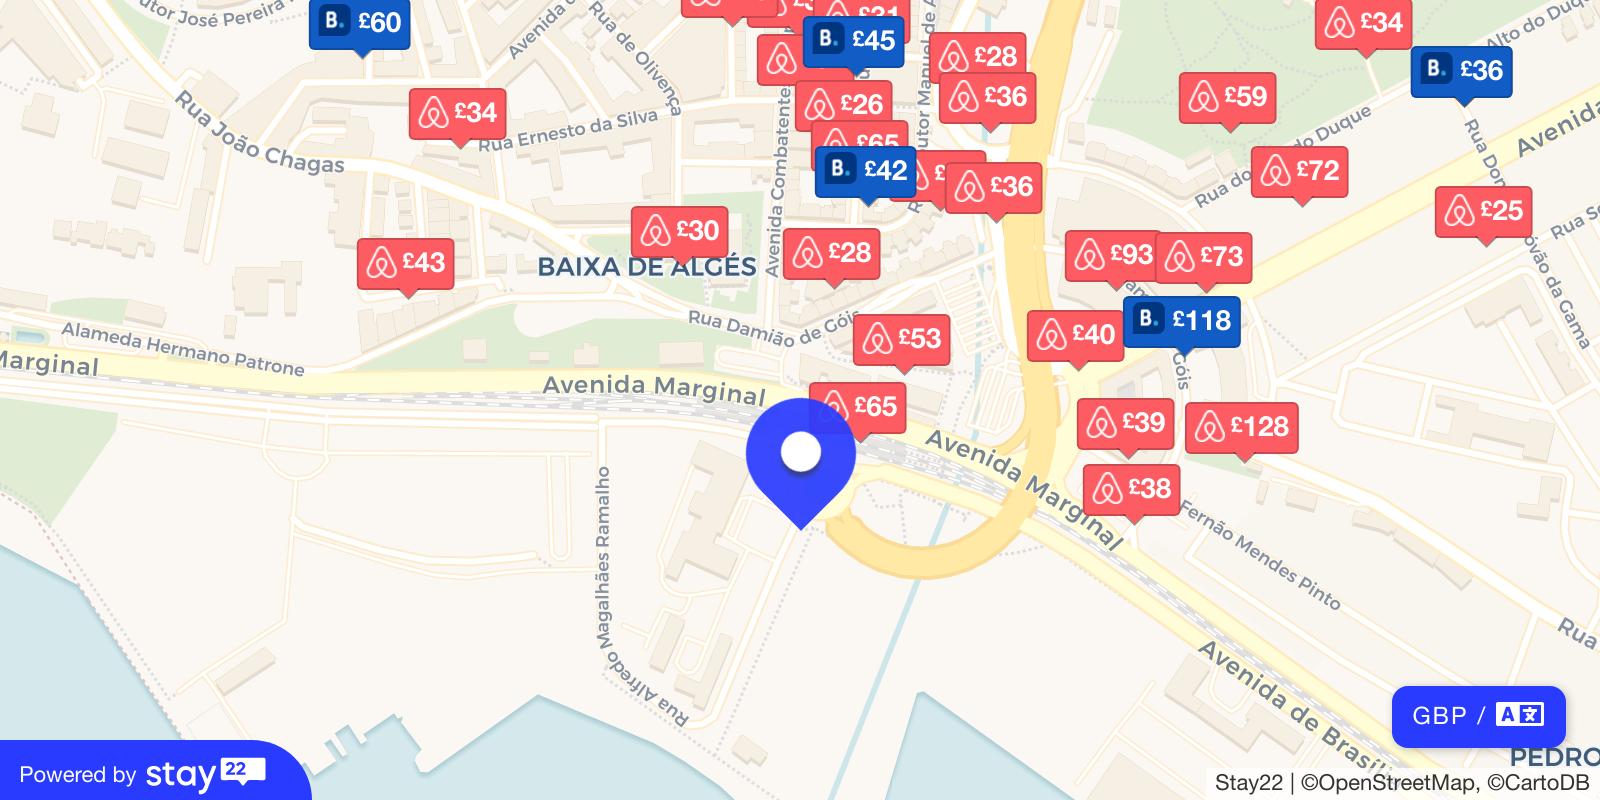 Places to stay near Passeio Maritimo de Alges